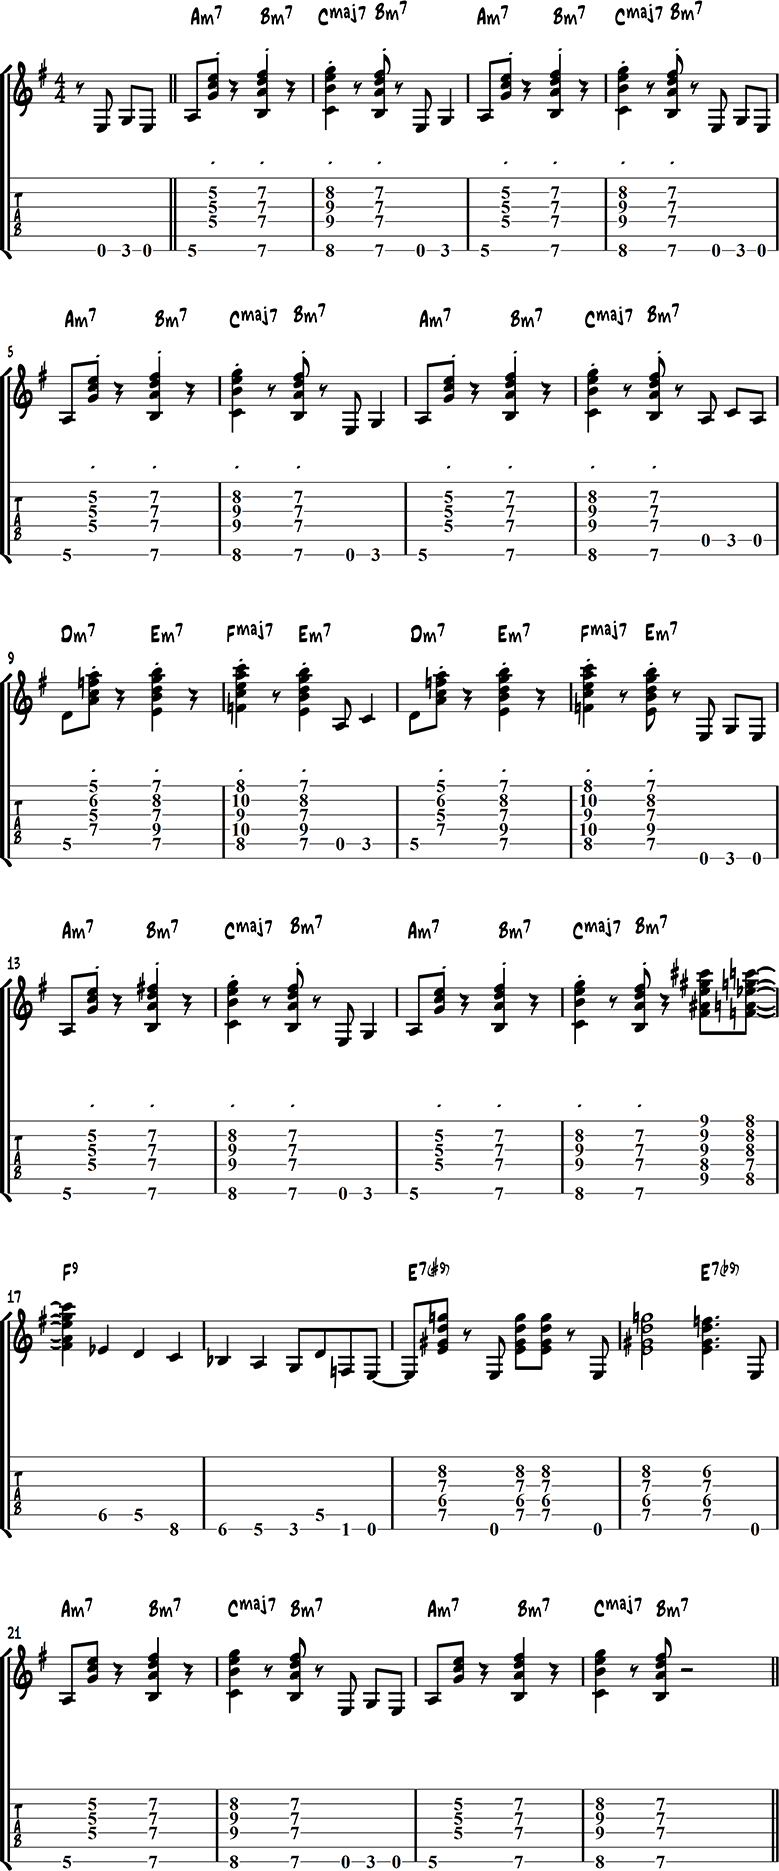 Kenny Burrell Minor Blues Chords Vamp